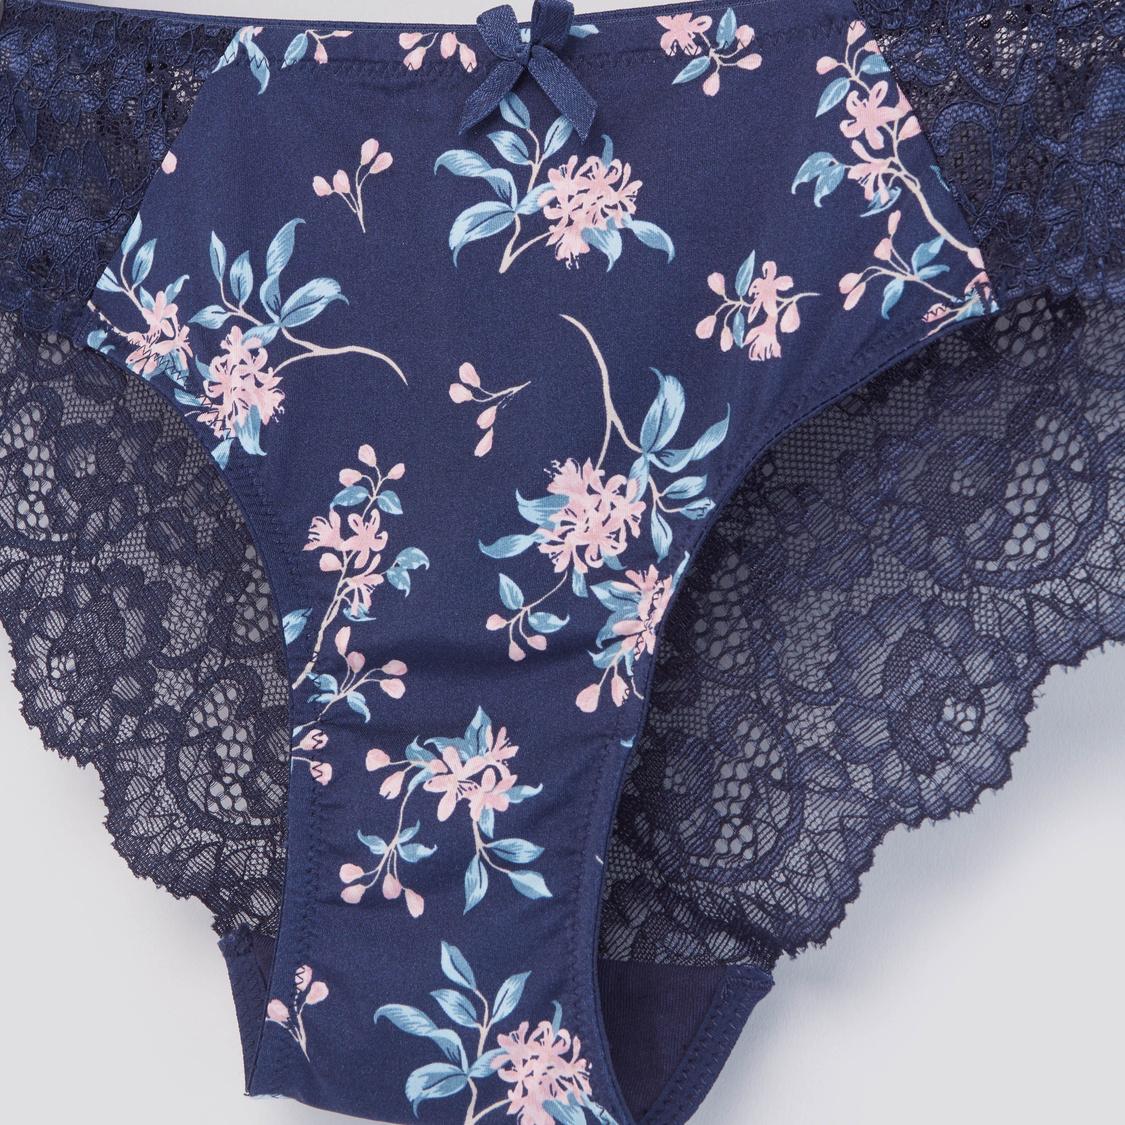 Floral Printed Bikini Briefs with Scalloped Lace Trim